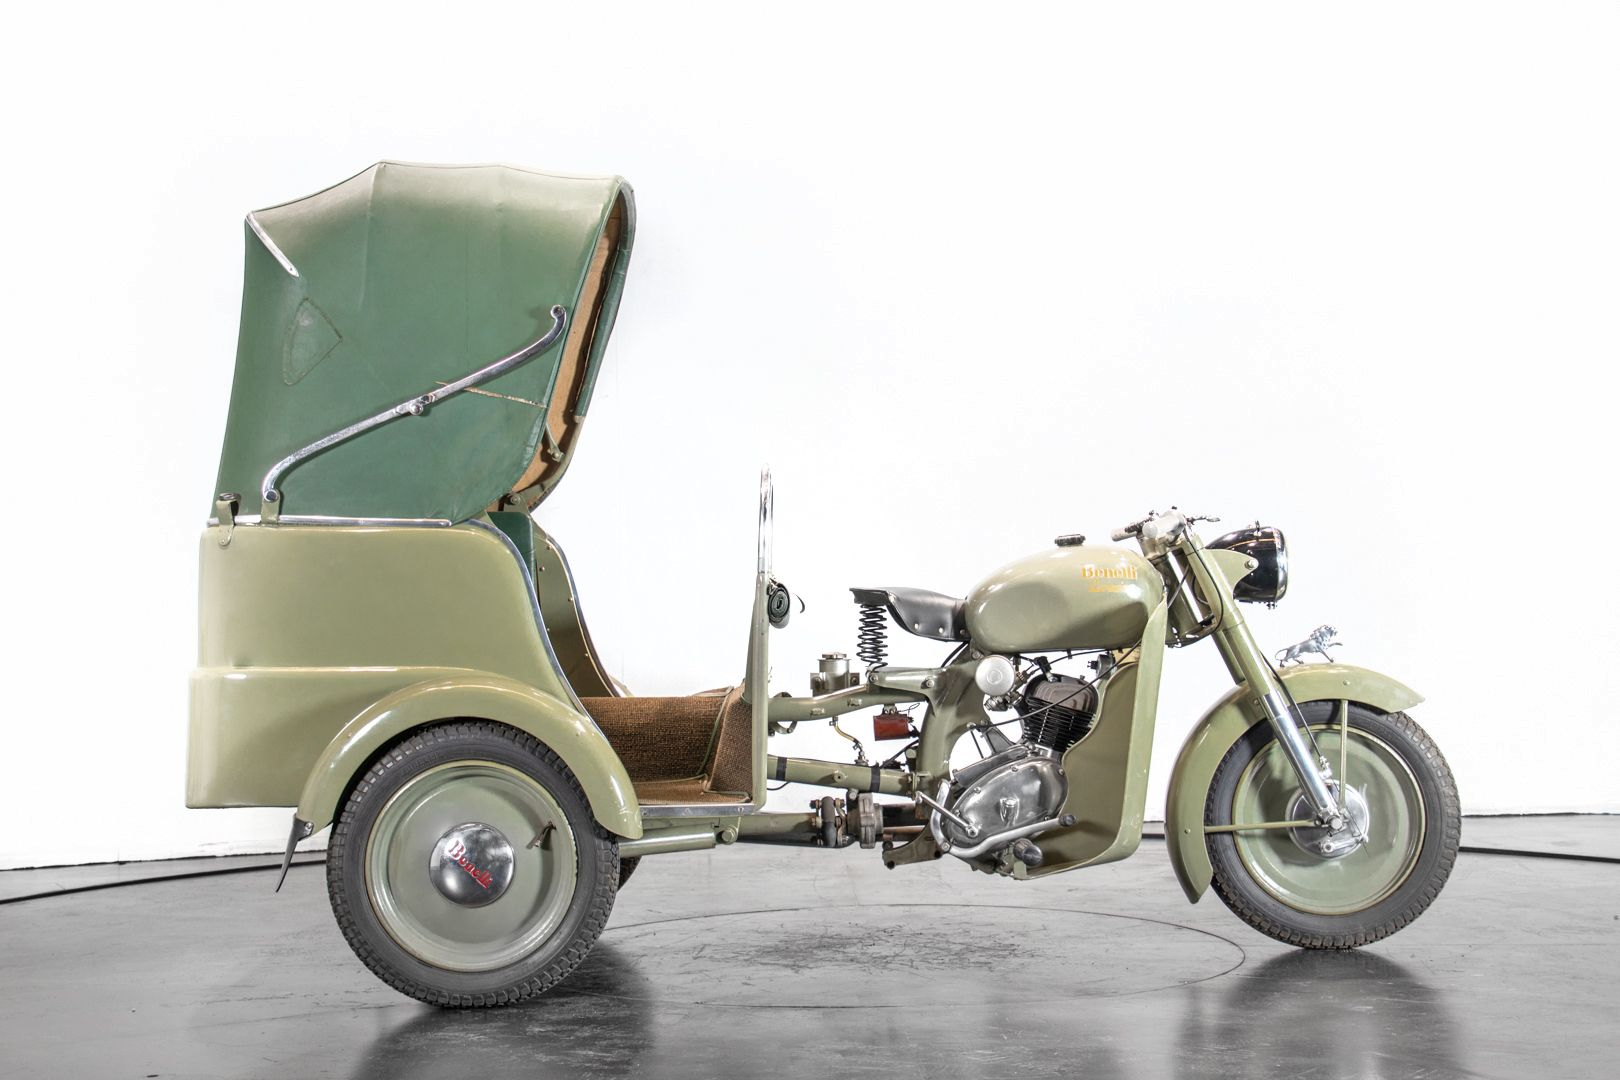 1956 Benelli 125 Leoncino Rikshaws 74319